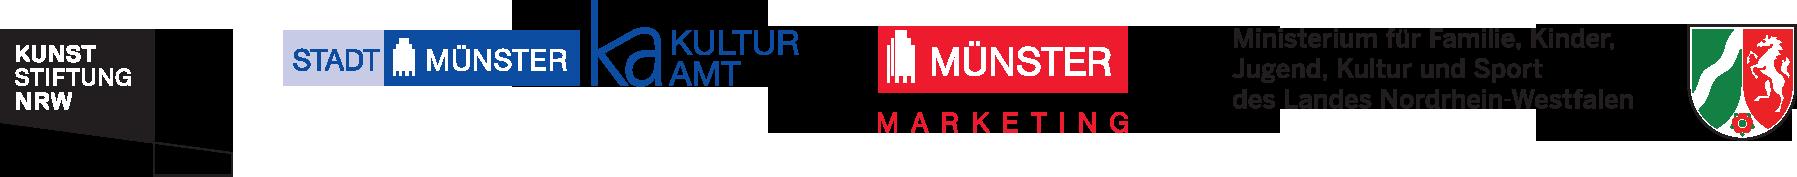 Logos: Kunststiftung NRW | Stadt Münster Kulturamt | Münster Marketing | Ministerium für Familie, Kinder, Jugend, Kultur und Sport des Landes NRW